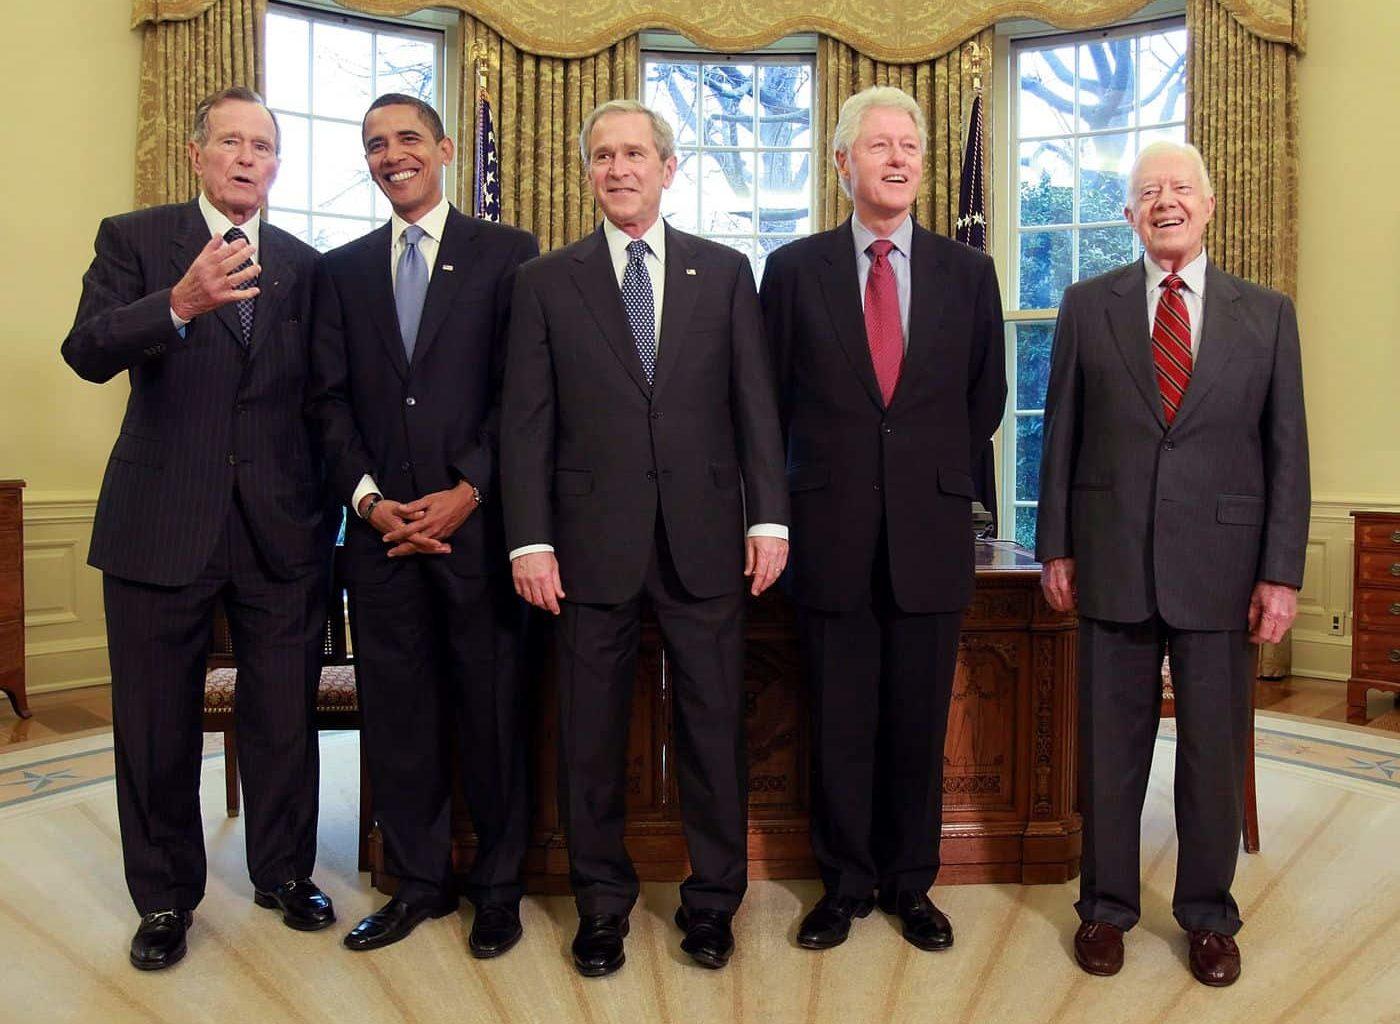 Jimmy Carter Was America's Last Great President